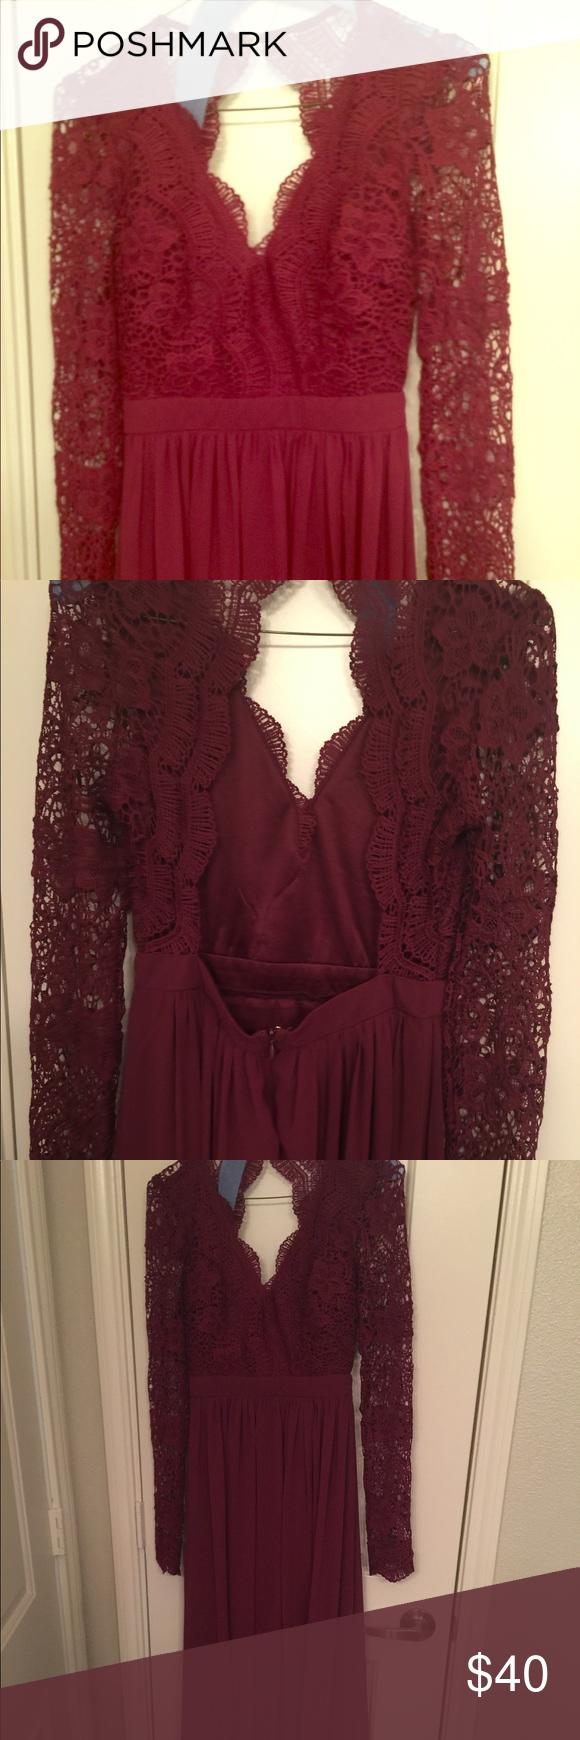 Eveningformal dress never been worn maroon long formal evening